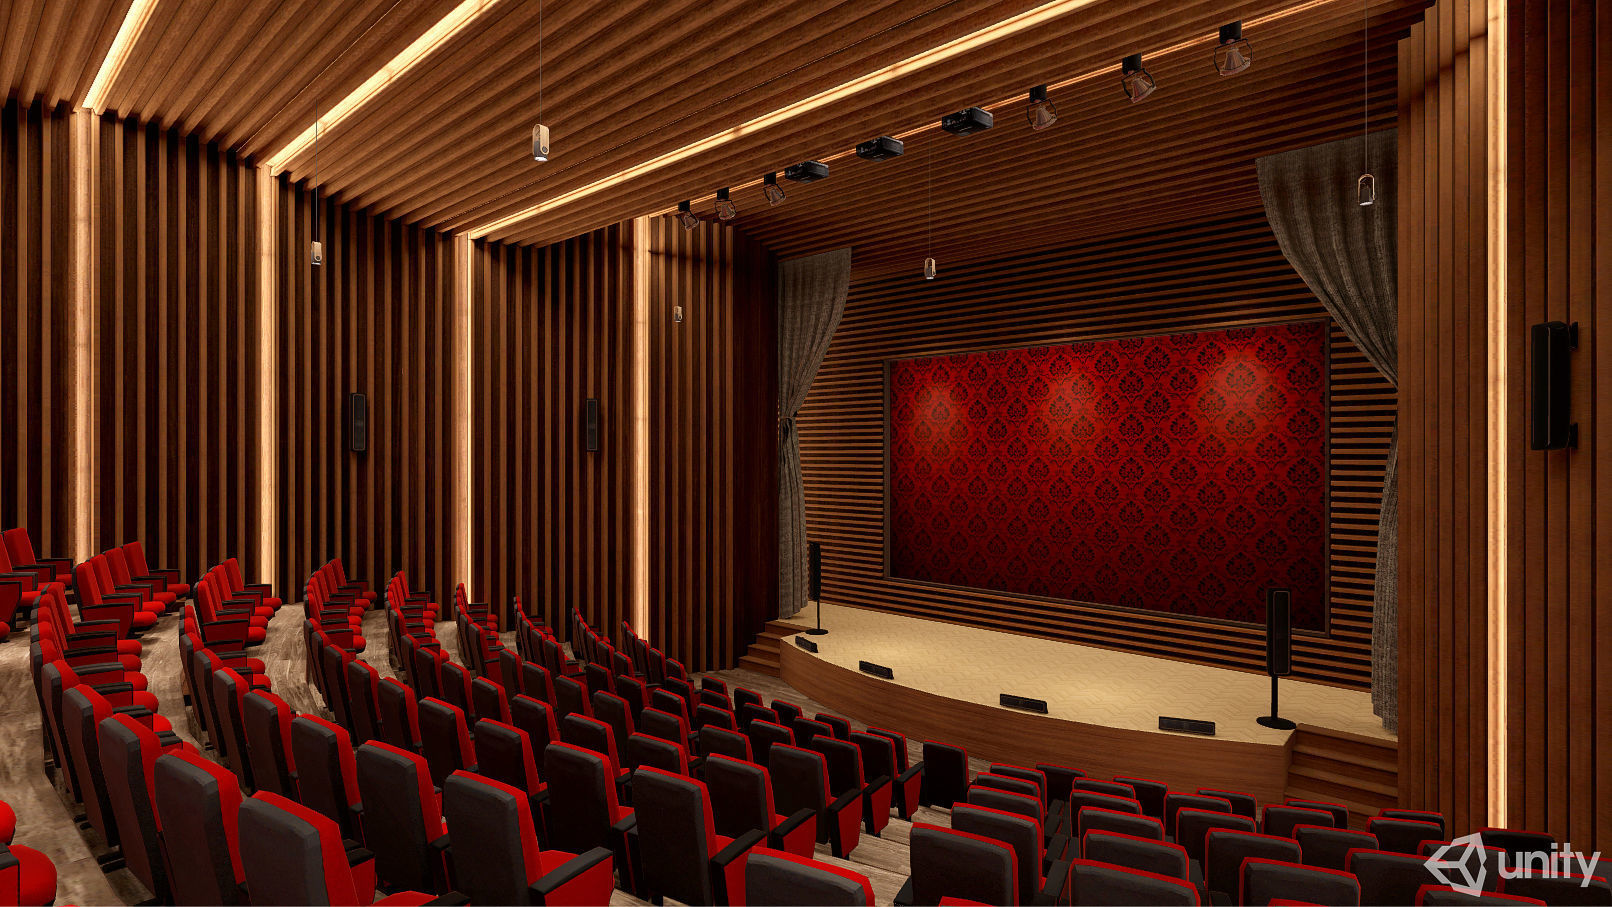 Auditorium VR AR Game Ready | 3D model